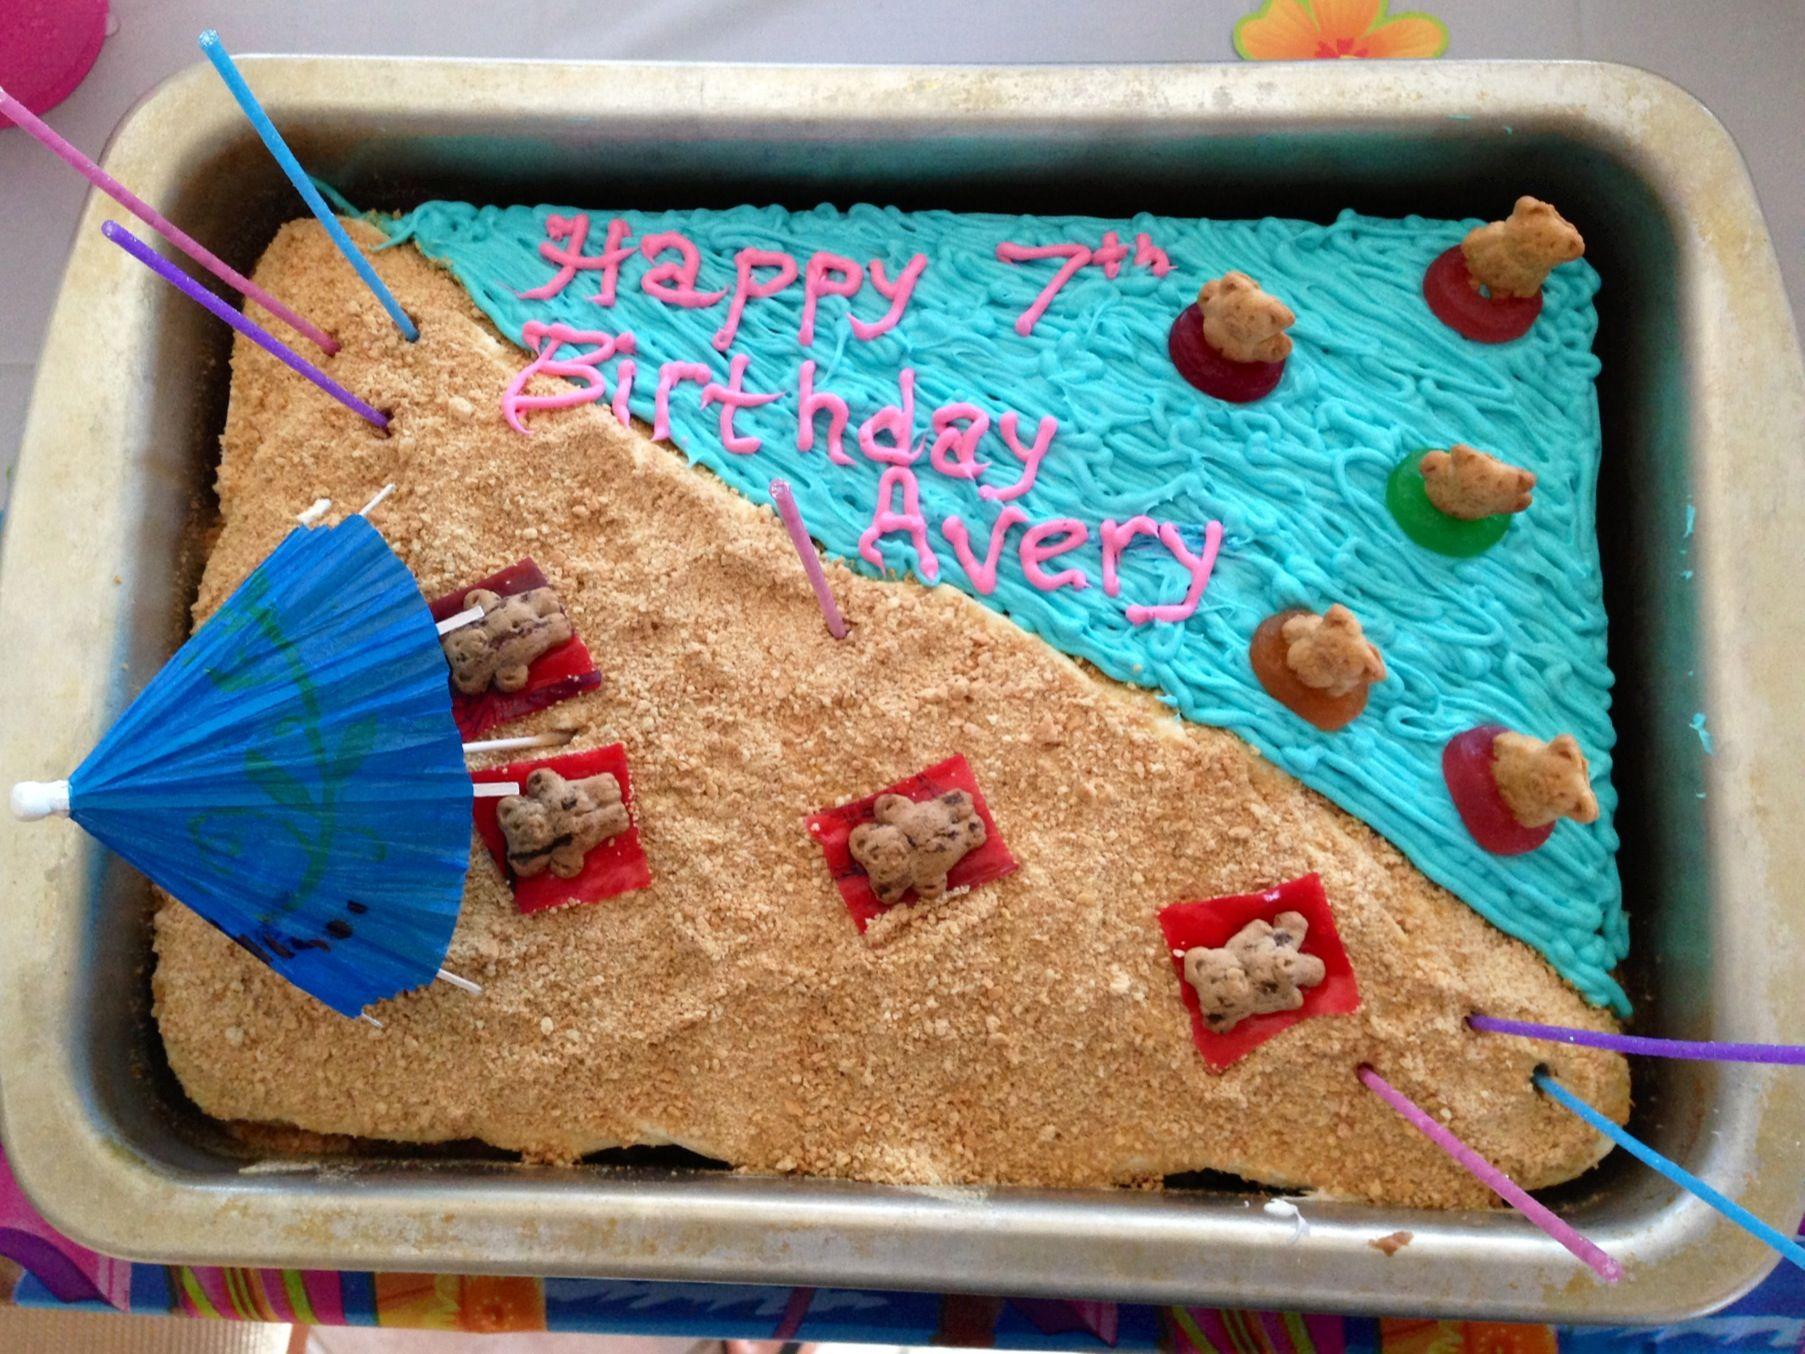 fun cake walk ideas 111811 fun and easy to make cake walk fun and easy to make cake walk bake ideas